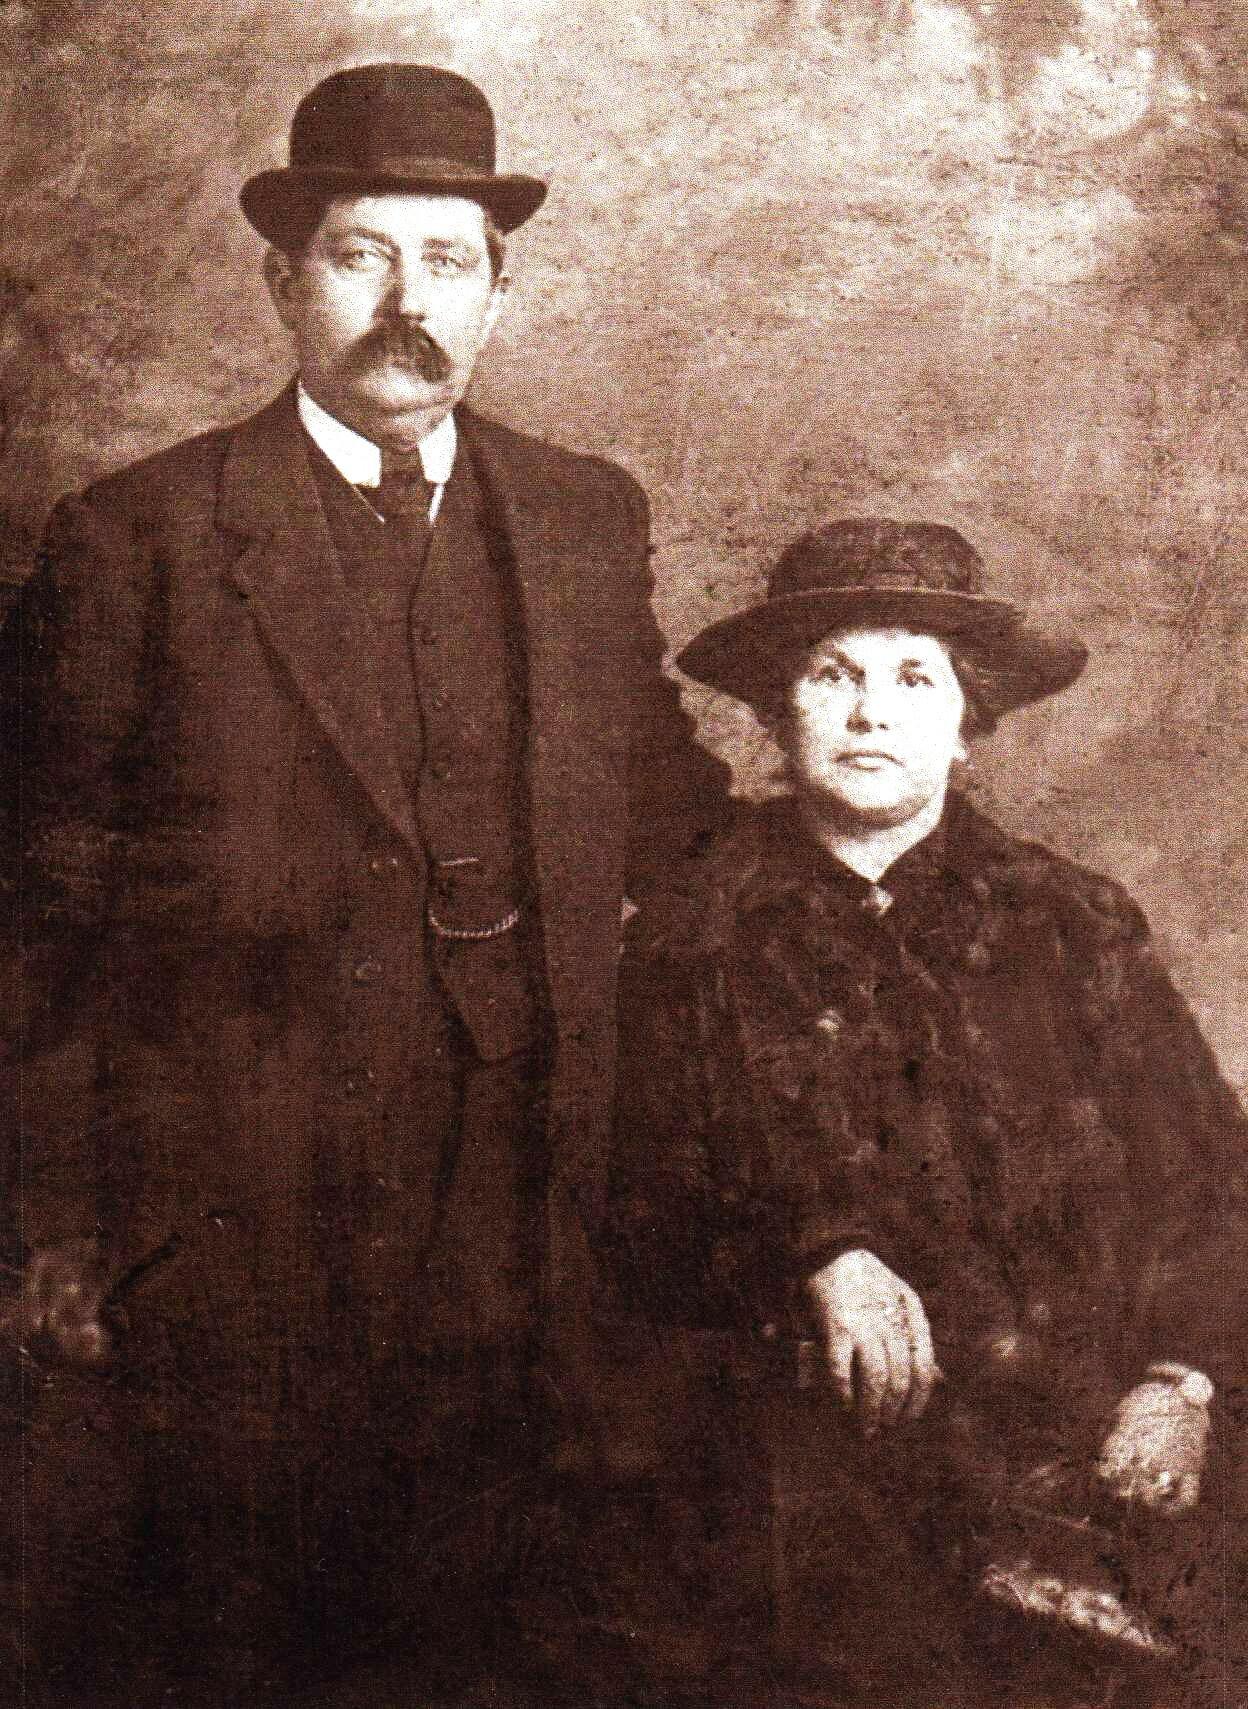 Figure 5. William Martin Devereux and Emma Maria Woodrow Devereux, nee Pengelly, my maternal grandparents. c. 1910.